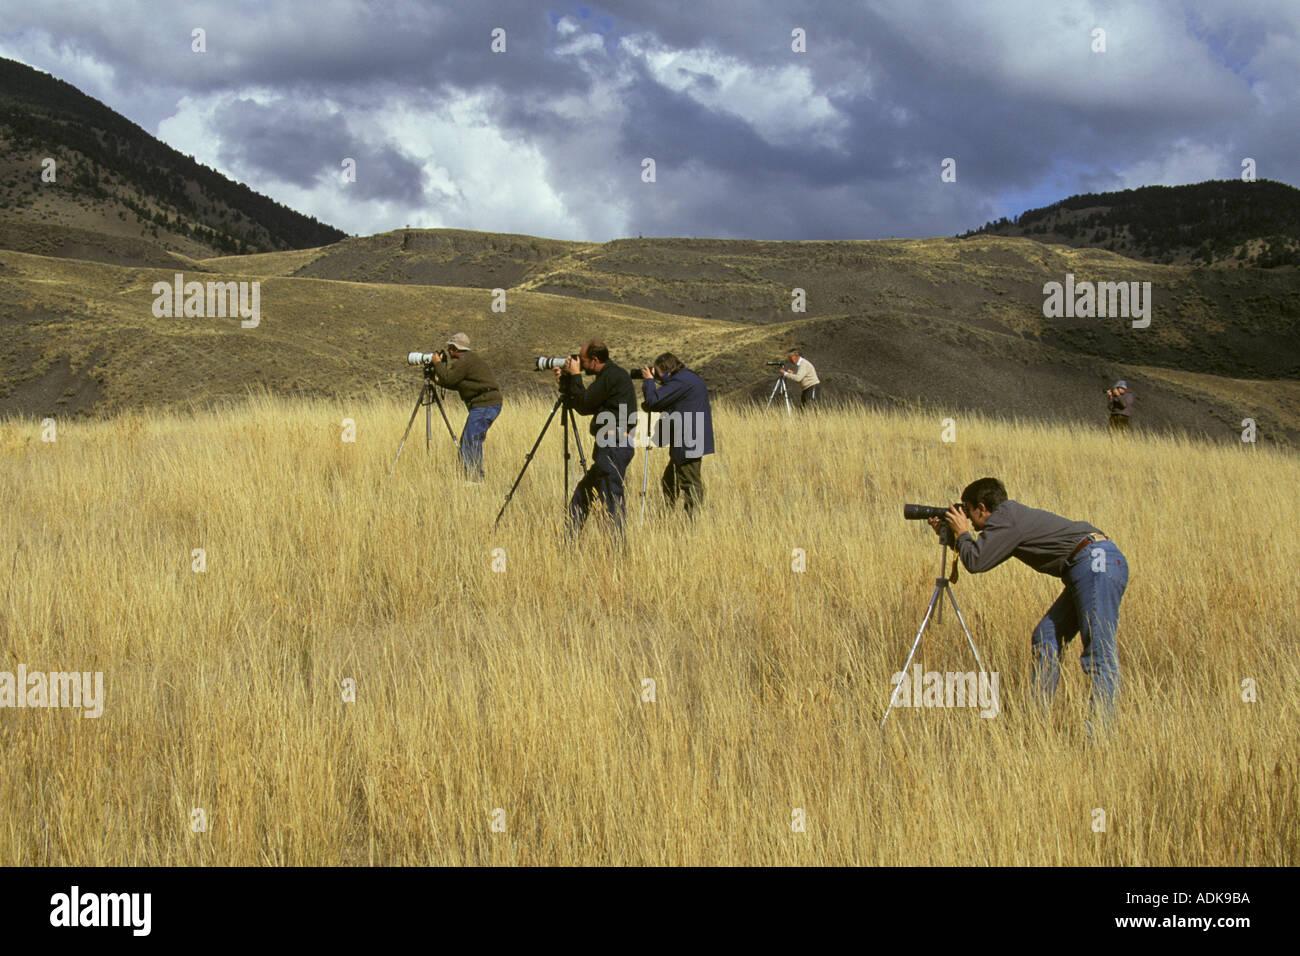 Sports Pastimes Photography Group of Wildlife Photographers - Stock Image